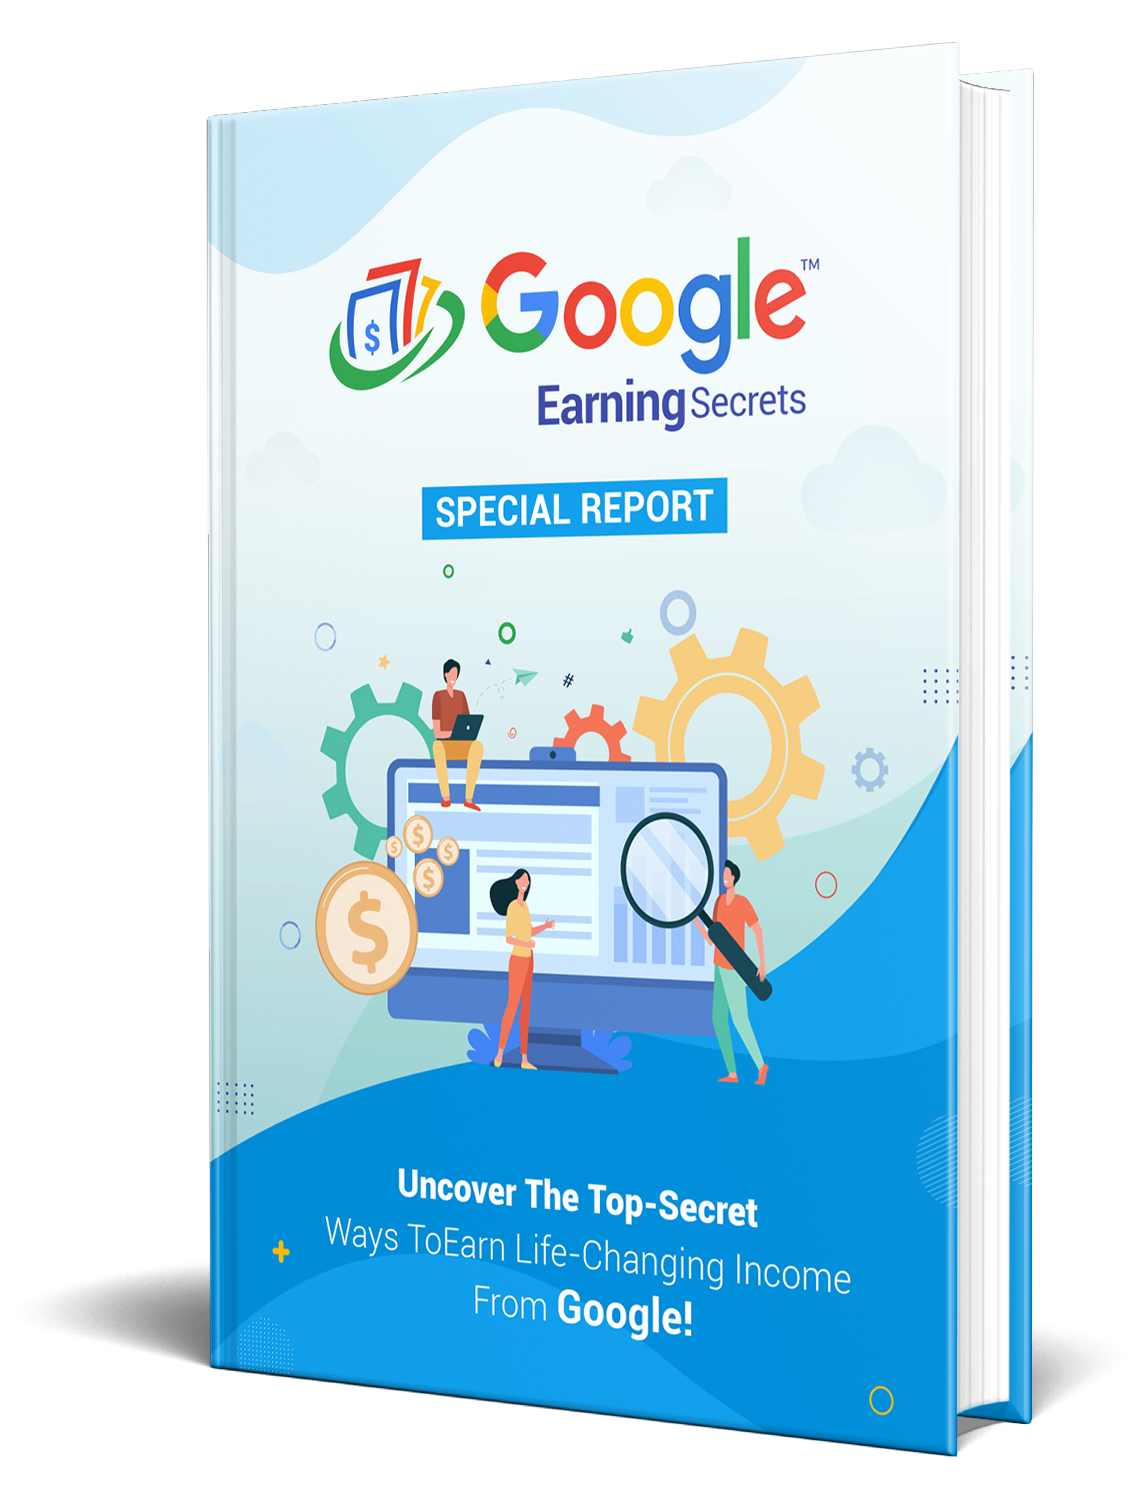 Earn Money Online From Google | Earn From Google - Free Report